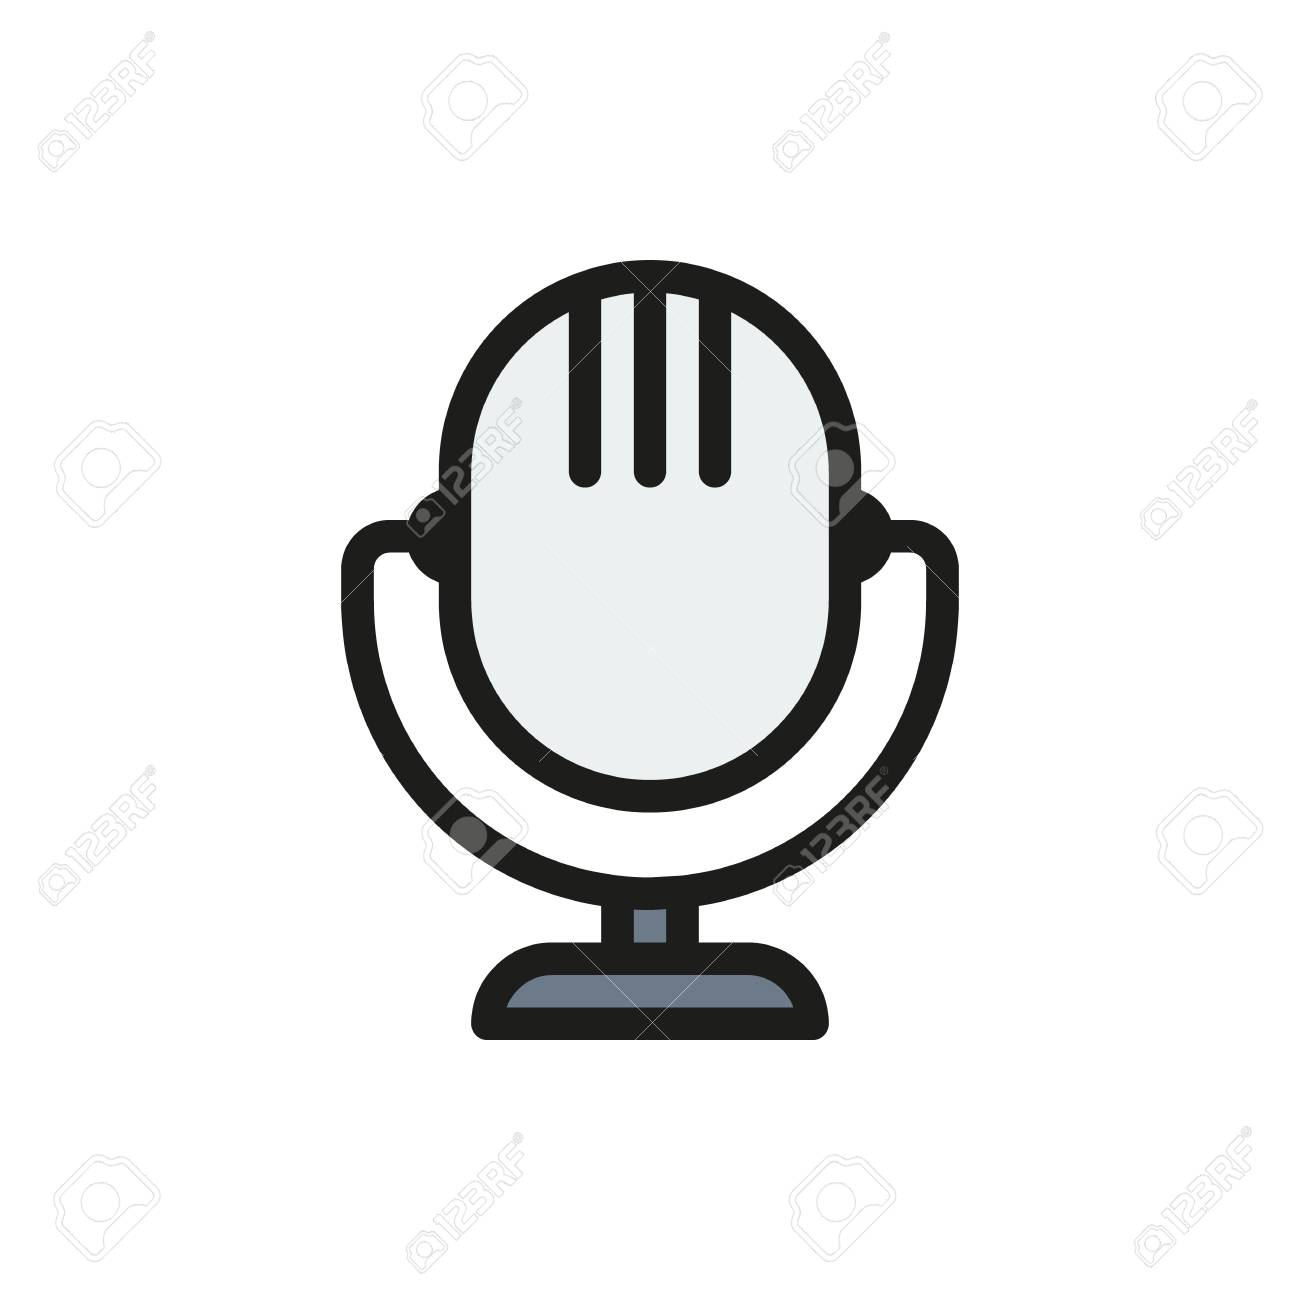 Icono De Microfono Retro Sobre Fondo Blanco Creado Para Movil Web